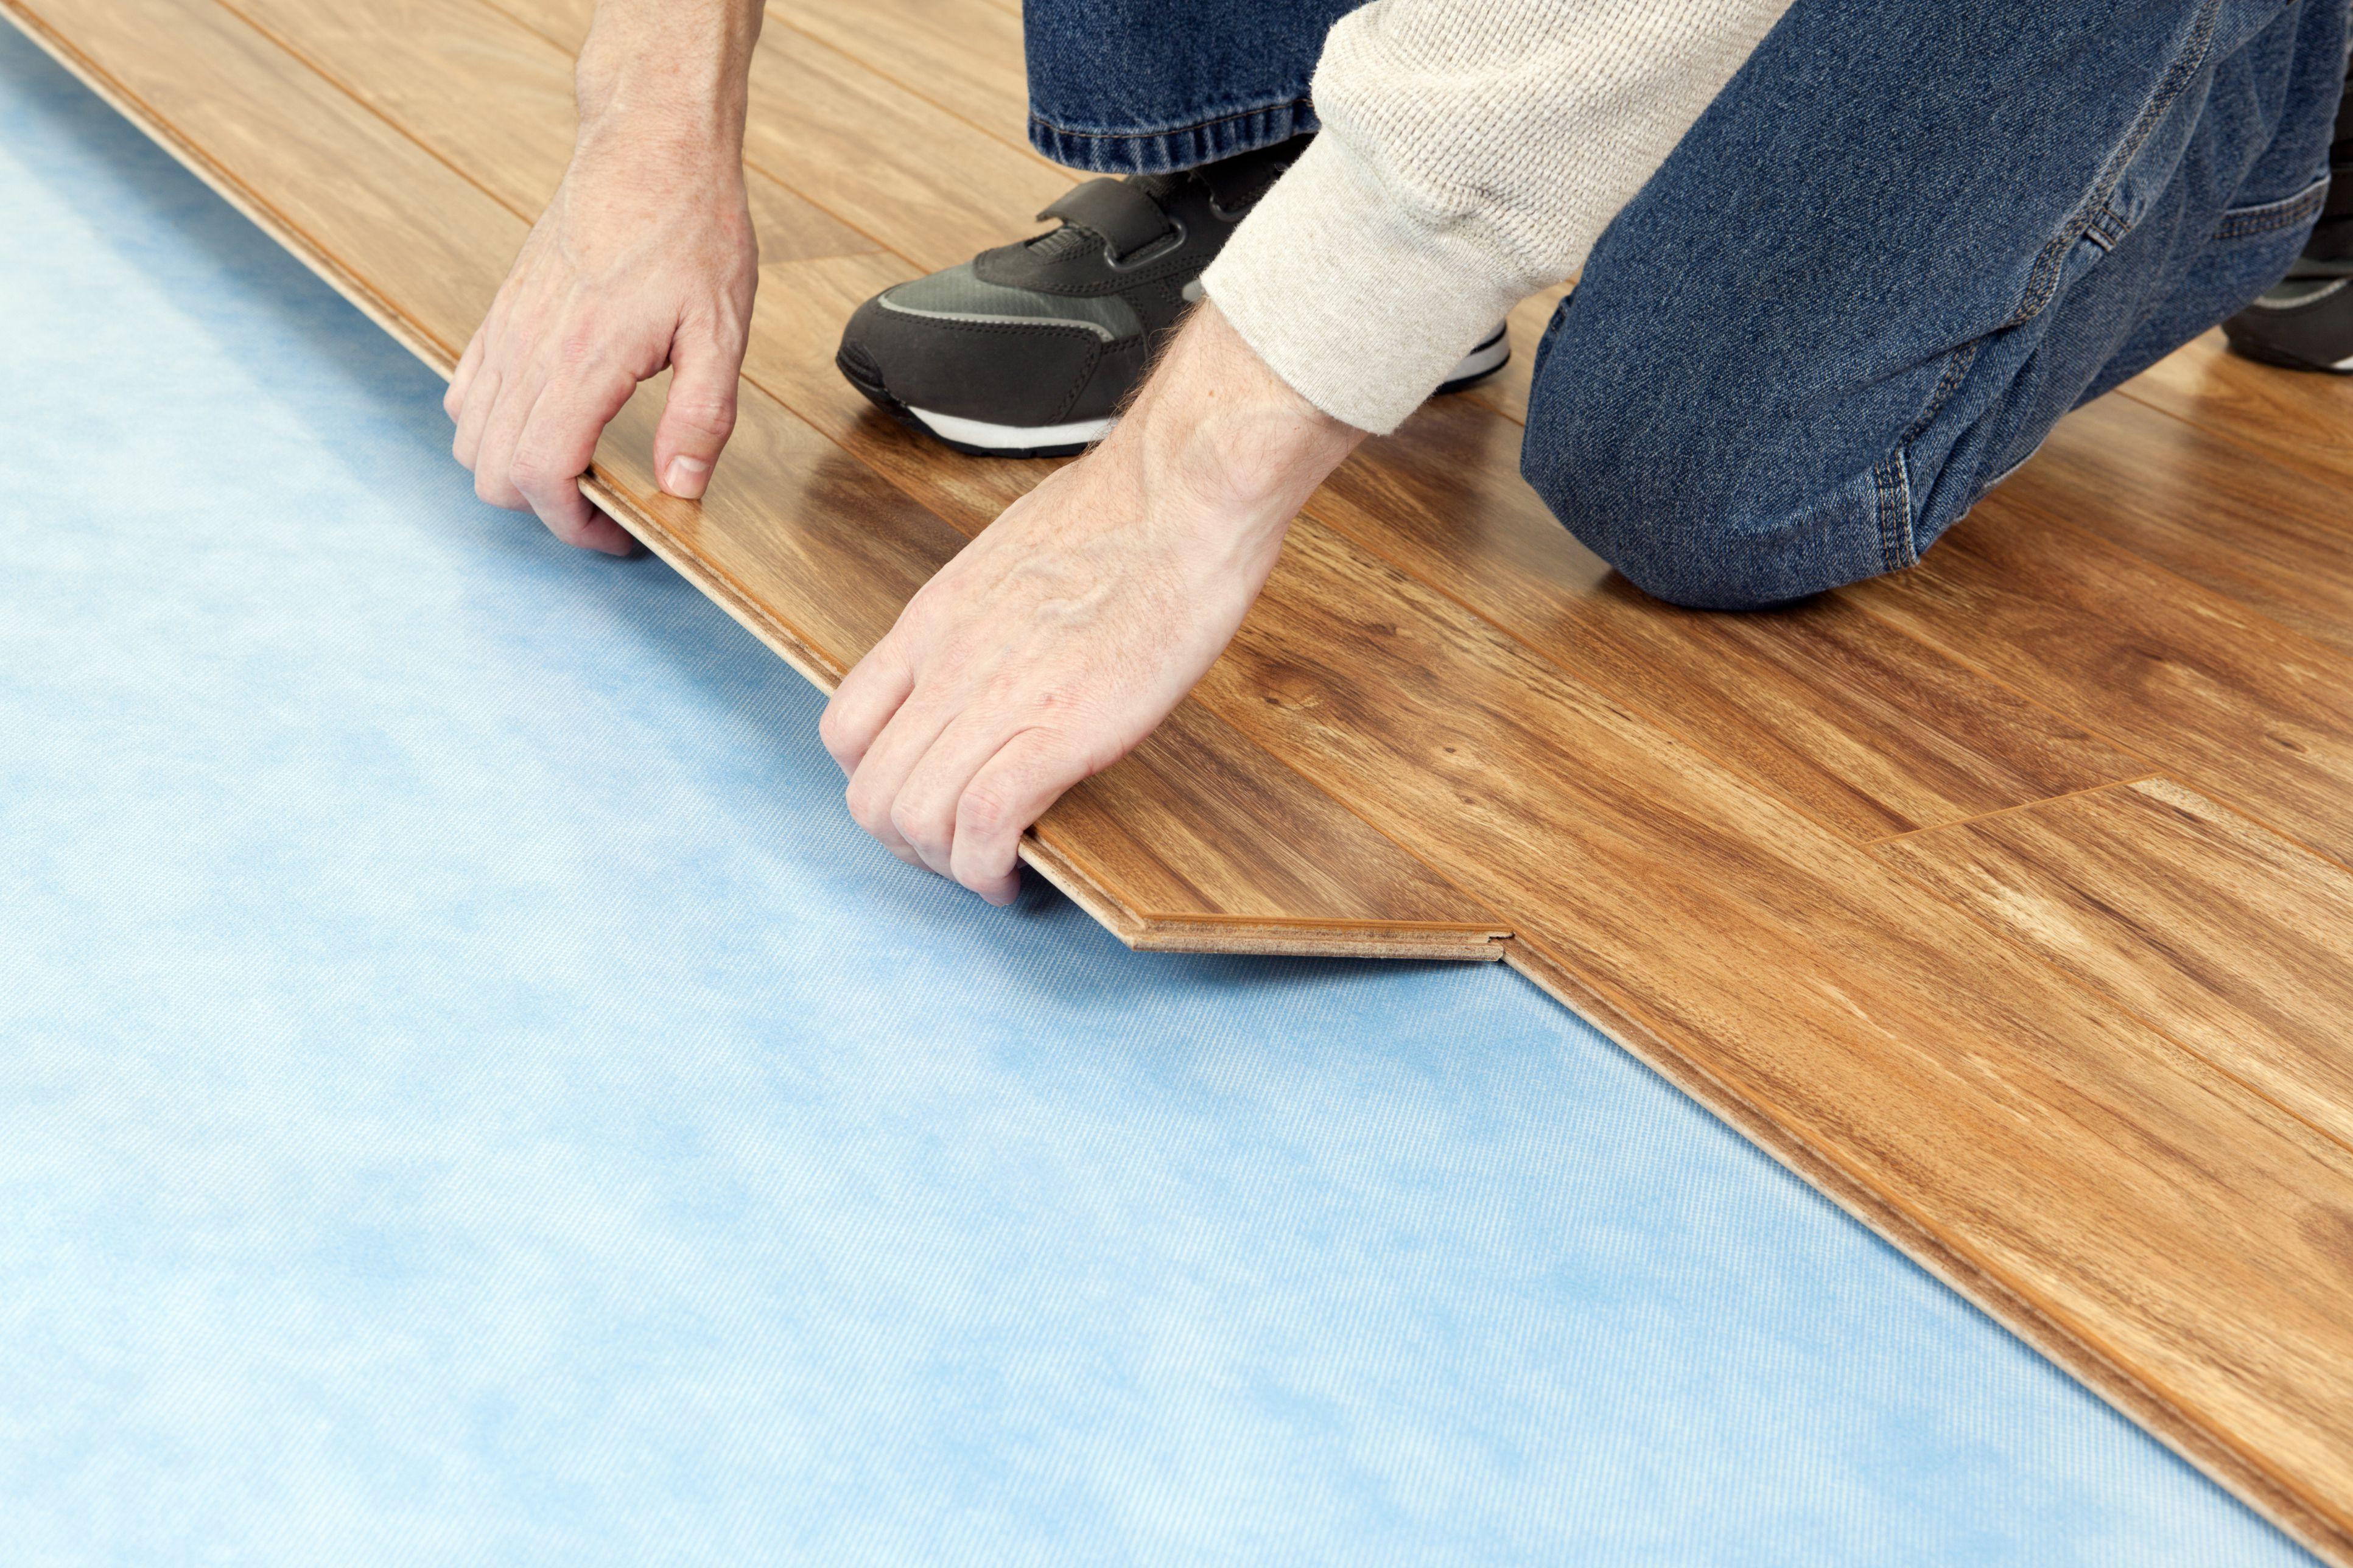 hardwood floor underlayment noise reduction of flooring underlayment the basics regarding new floor installation 185270632 582b722c3df78c6f6af0a8ab